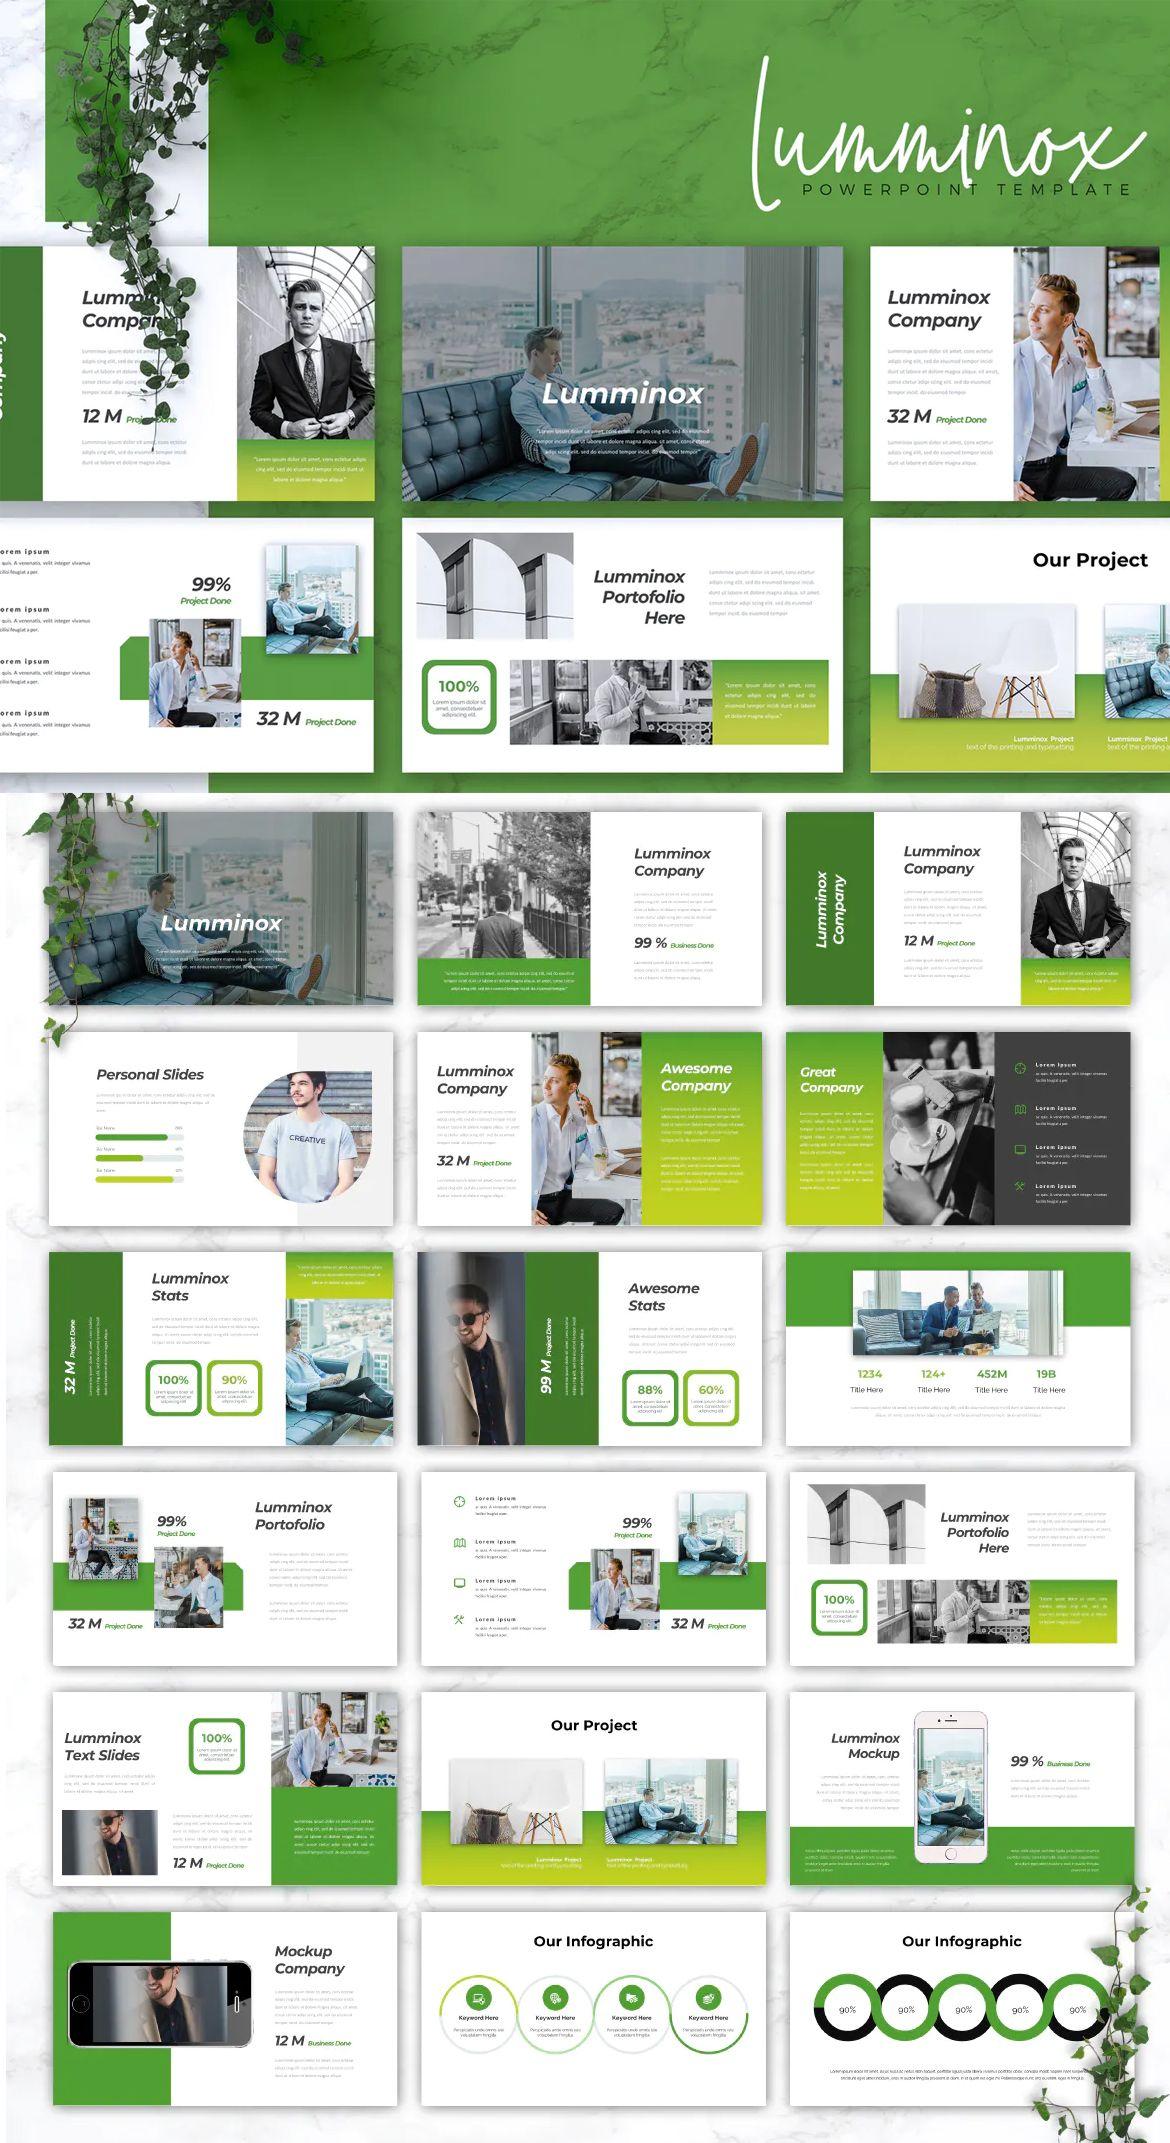 Lumminox Business Powerpoint Template By Rahardicreative On Envato Elements Business Powerpoint Templates Business Powerpoint Presentation Powerpoint Presentation Templates